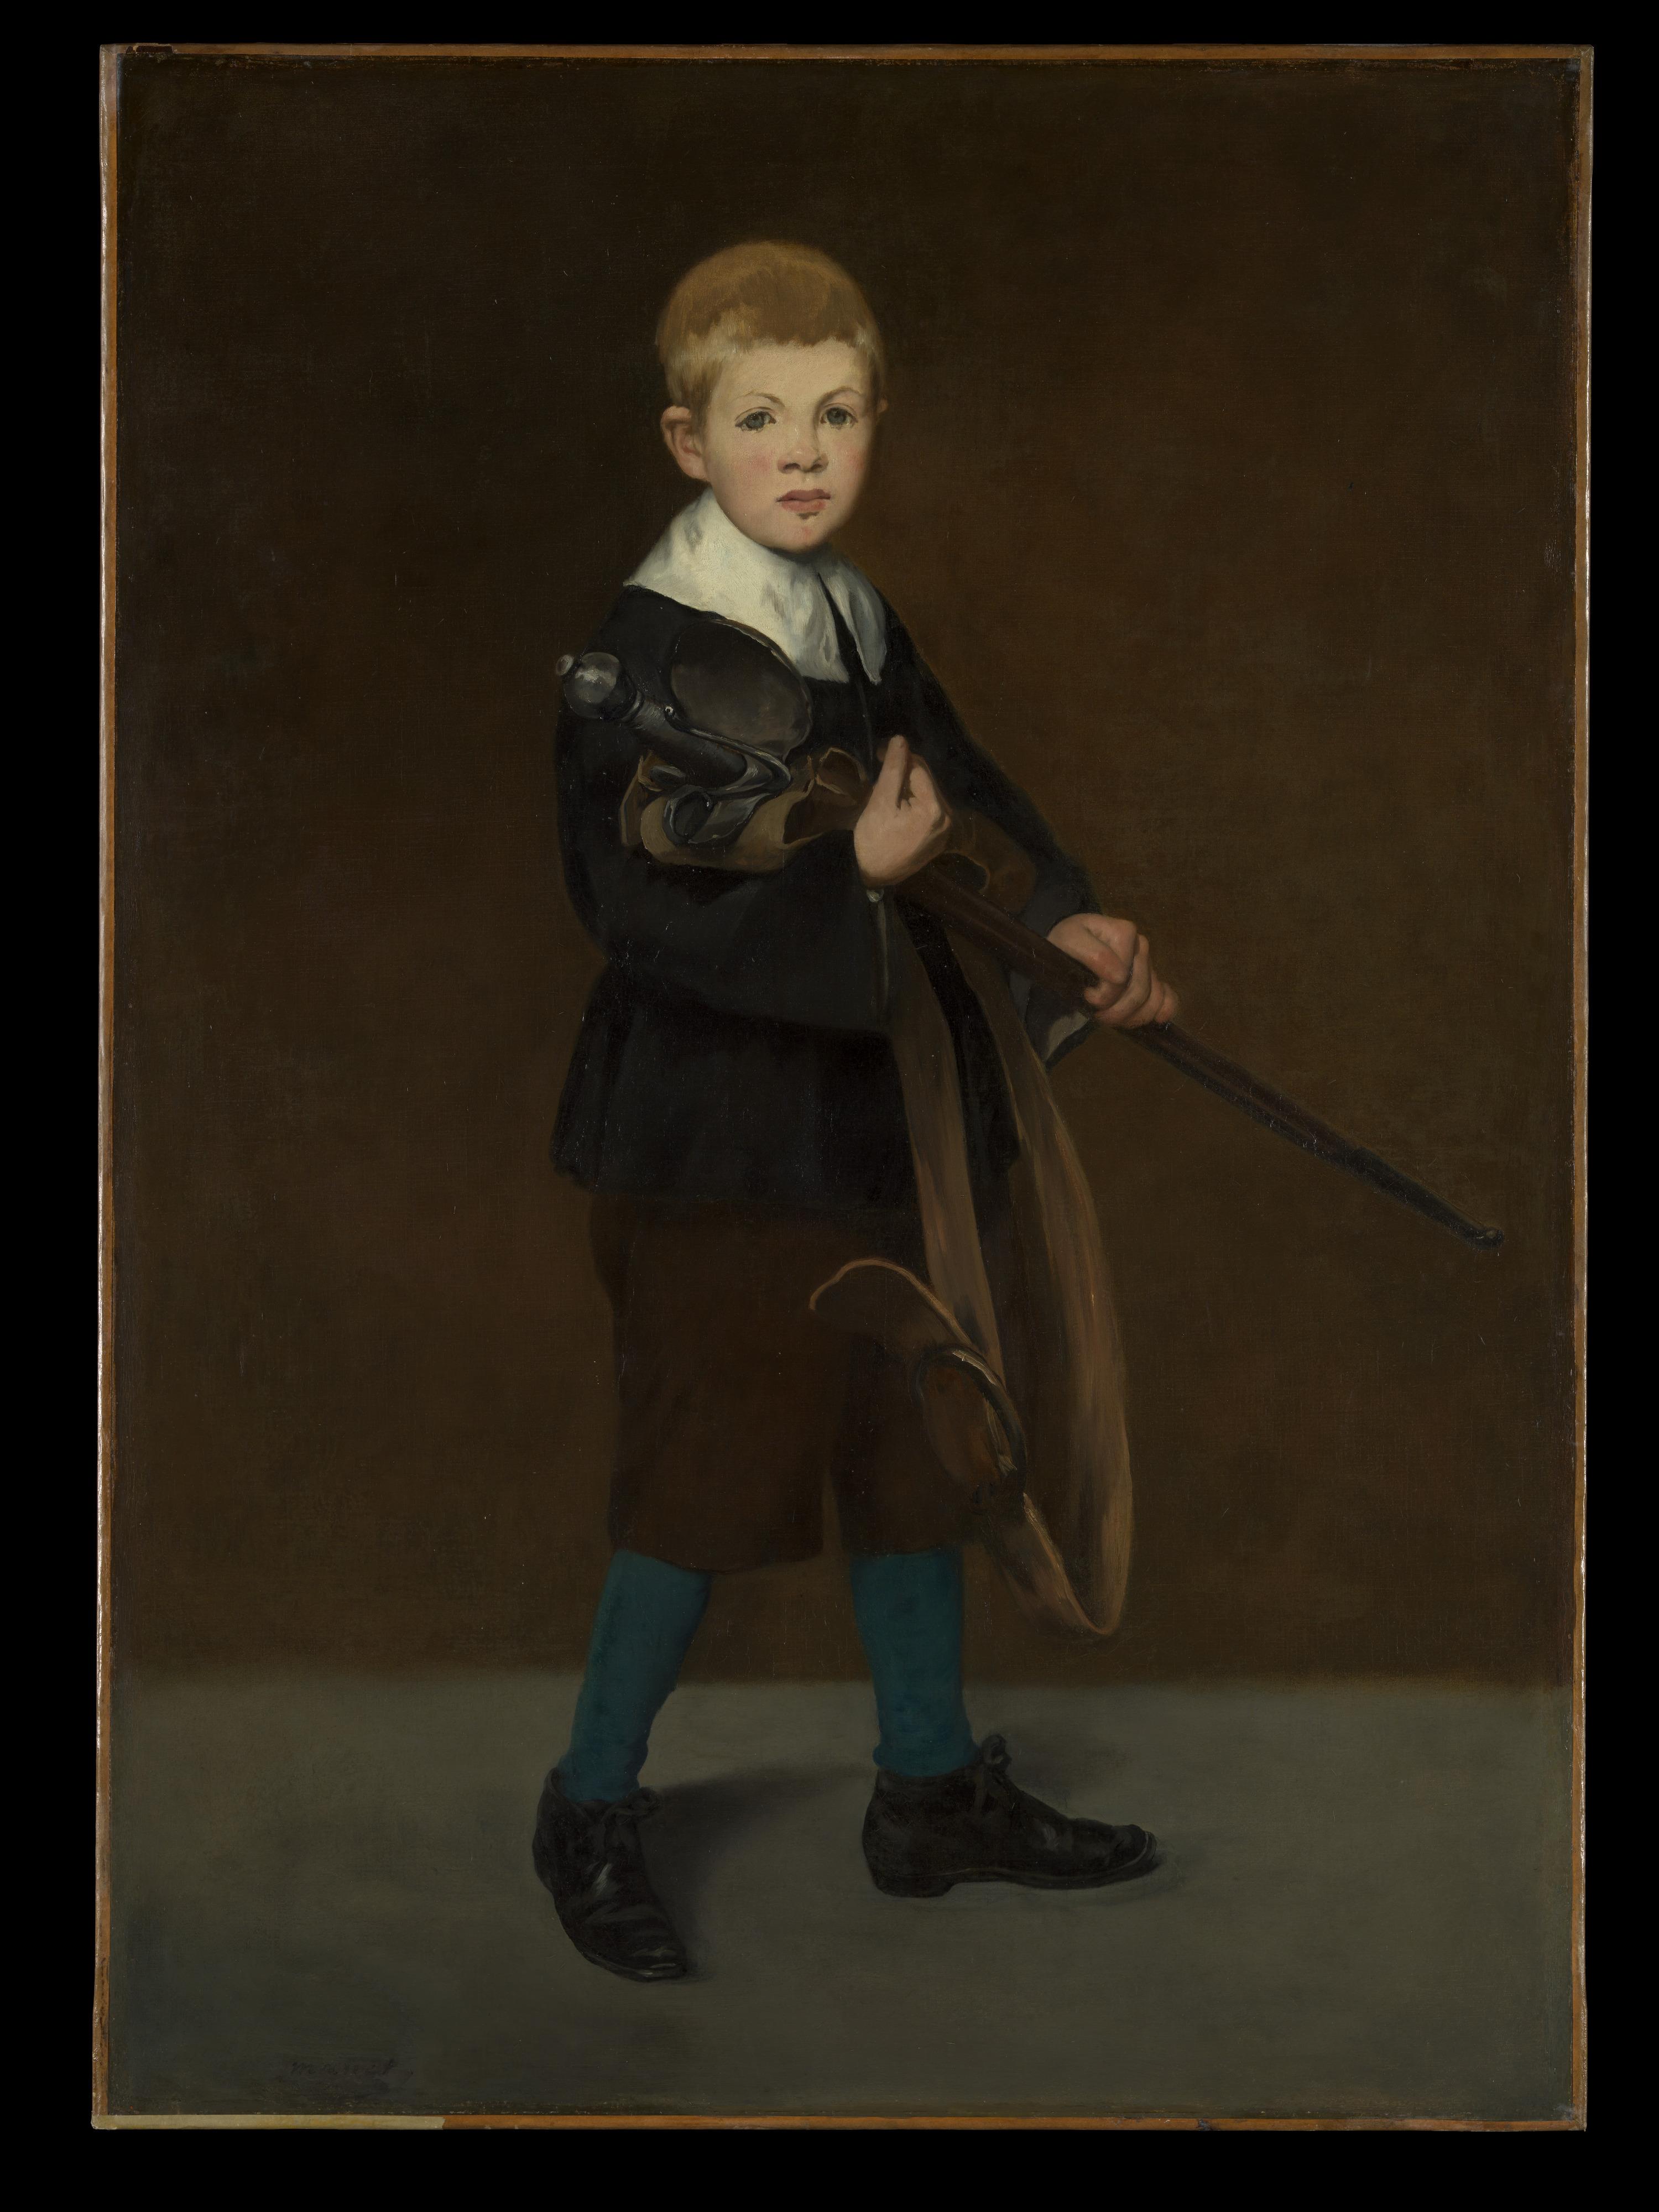 Картинки по запросу boy with a sword by edouard manet